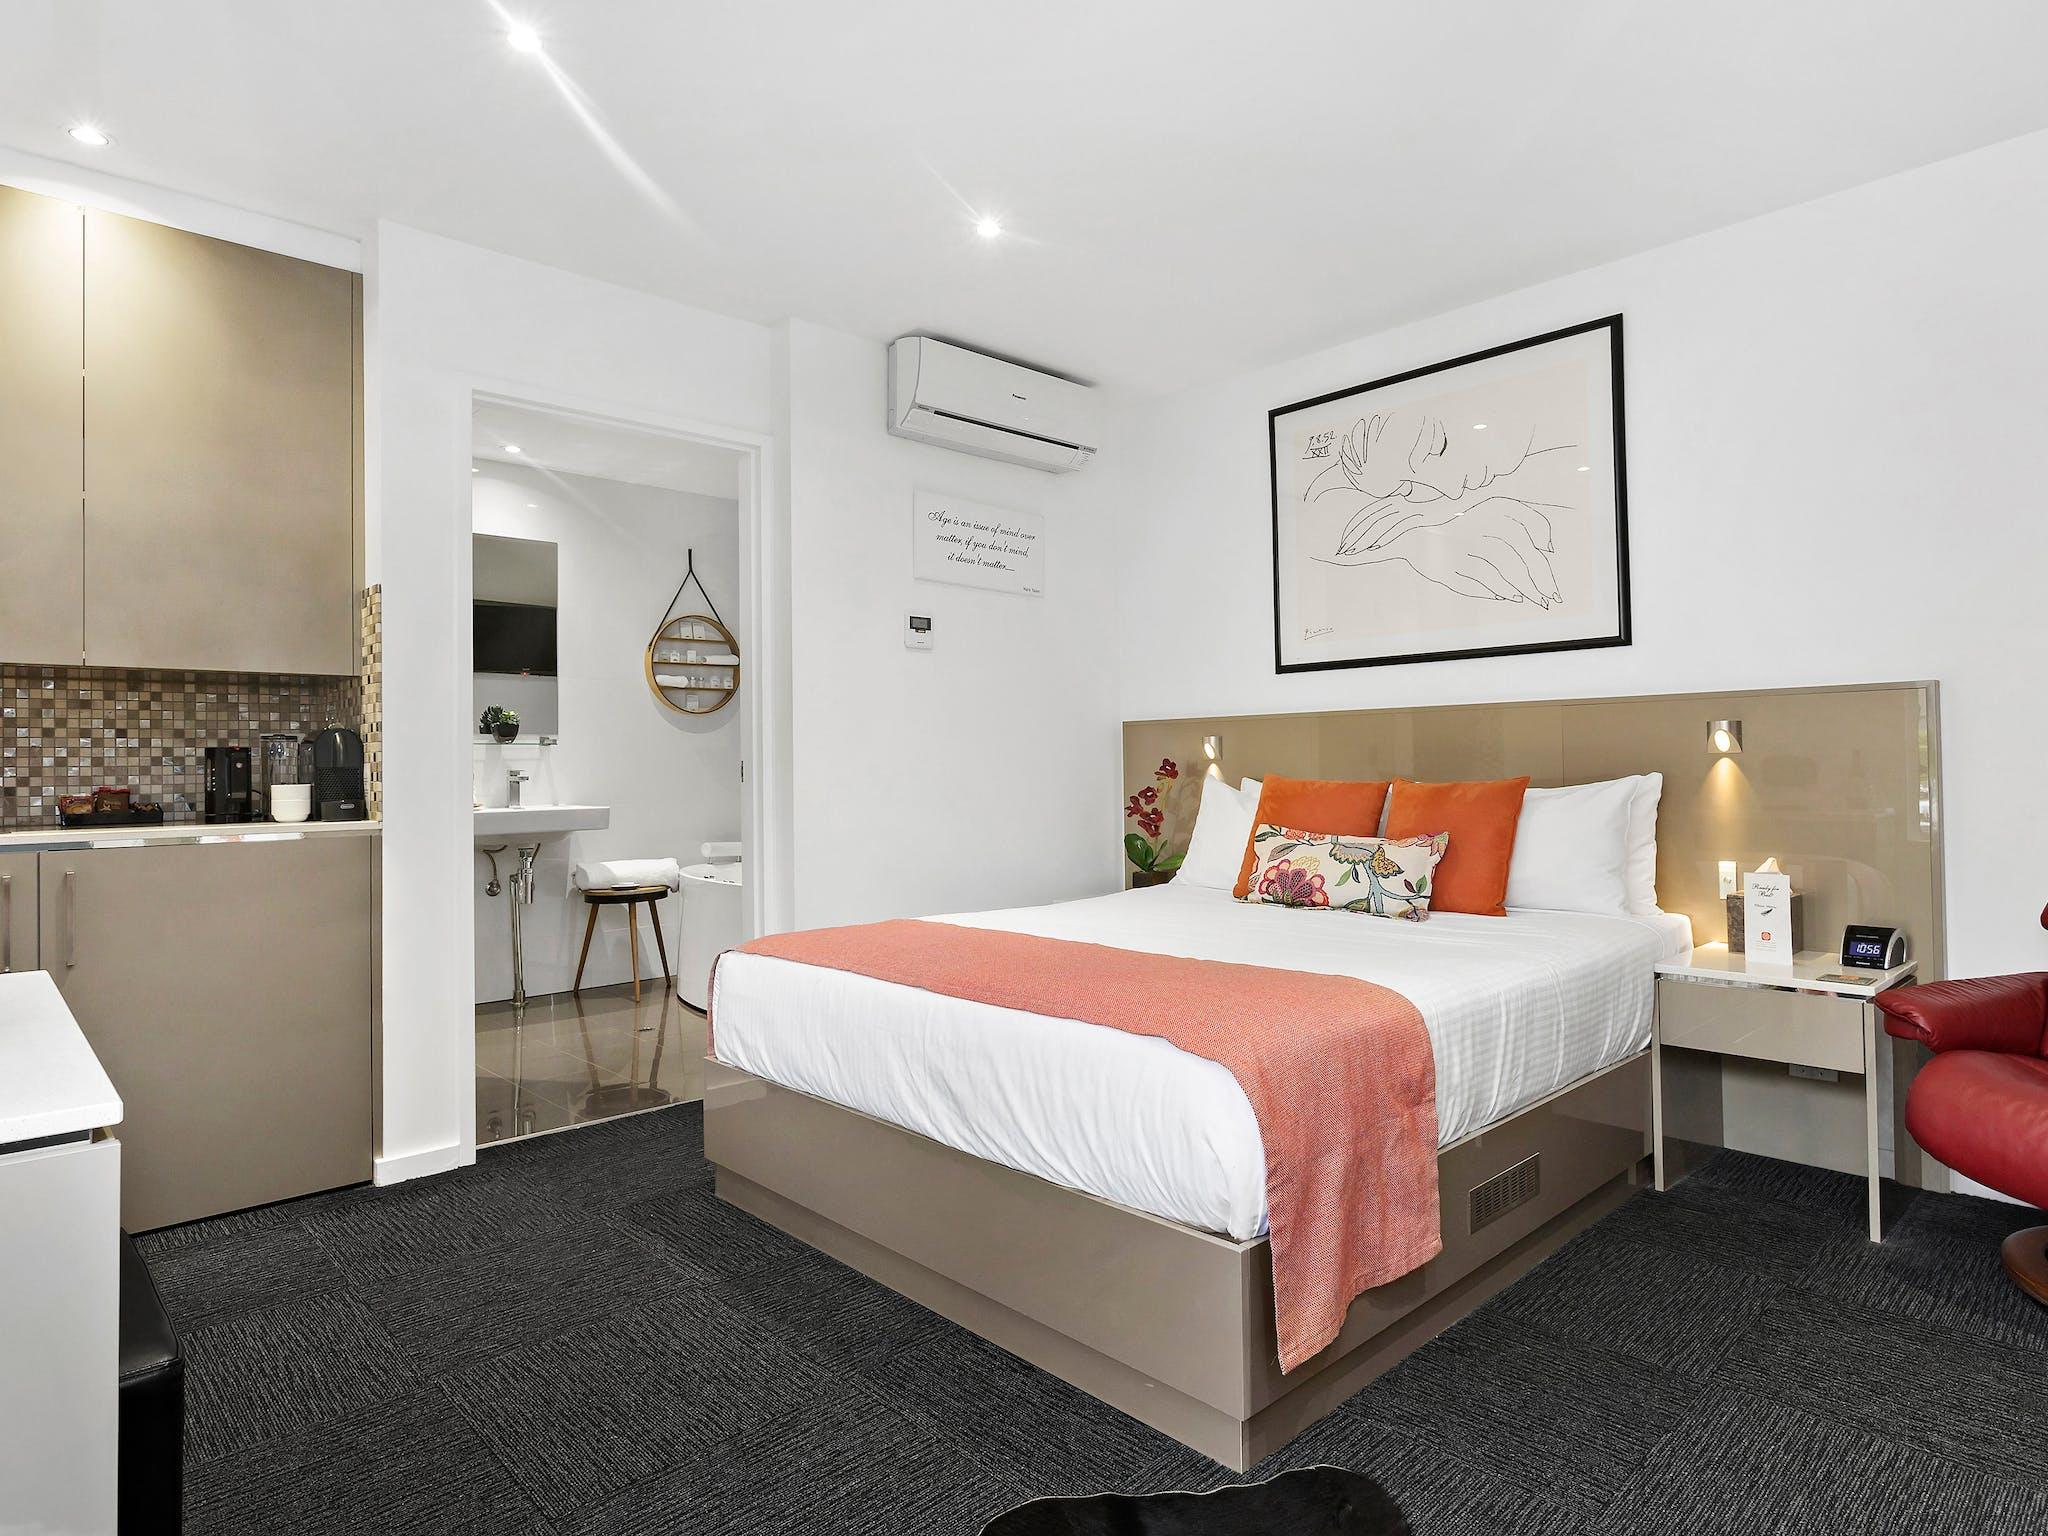 North Adelaide Boutique Stays Accommodation Slider Image 1